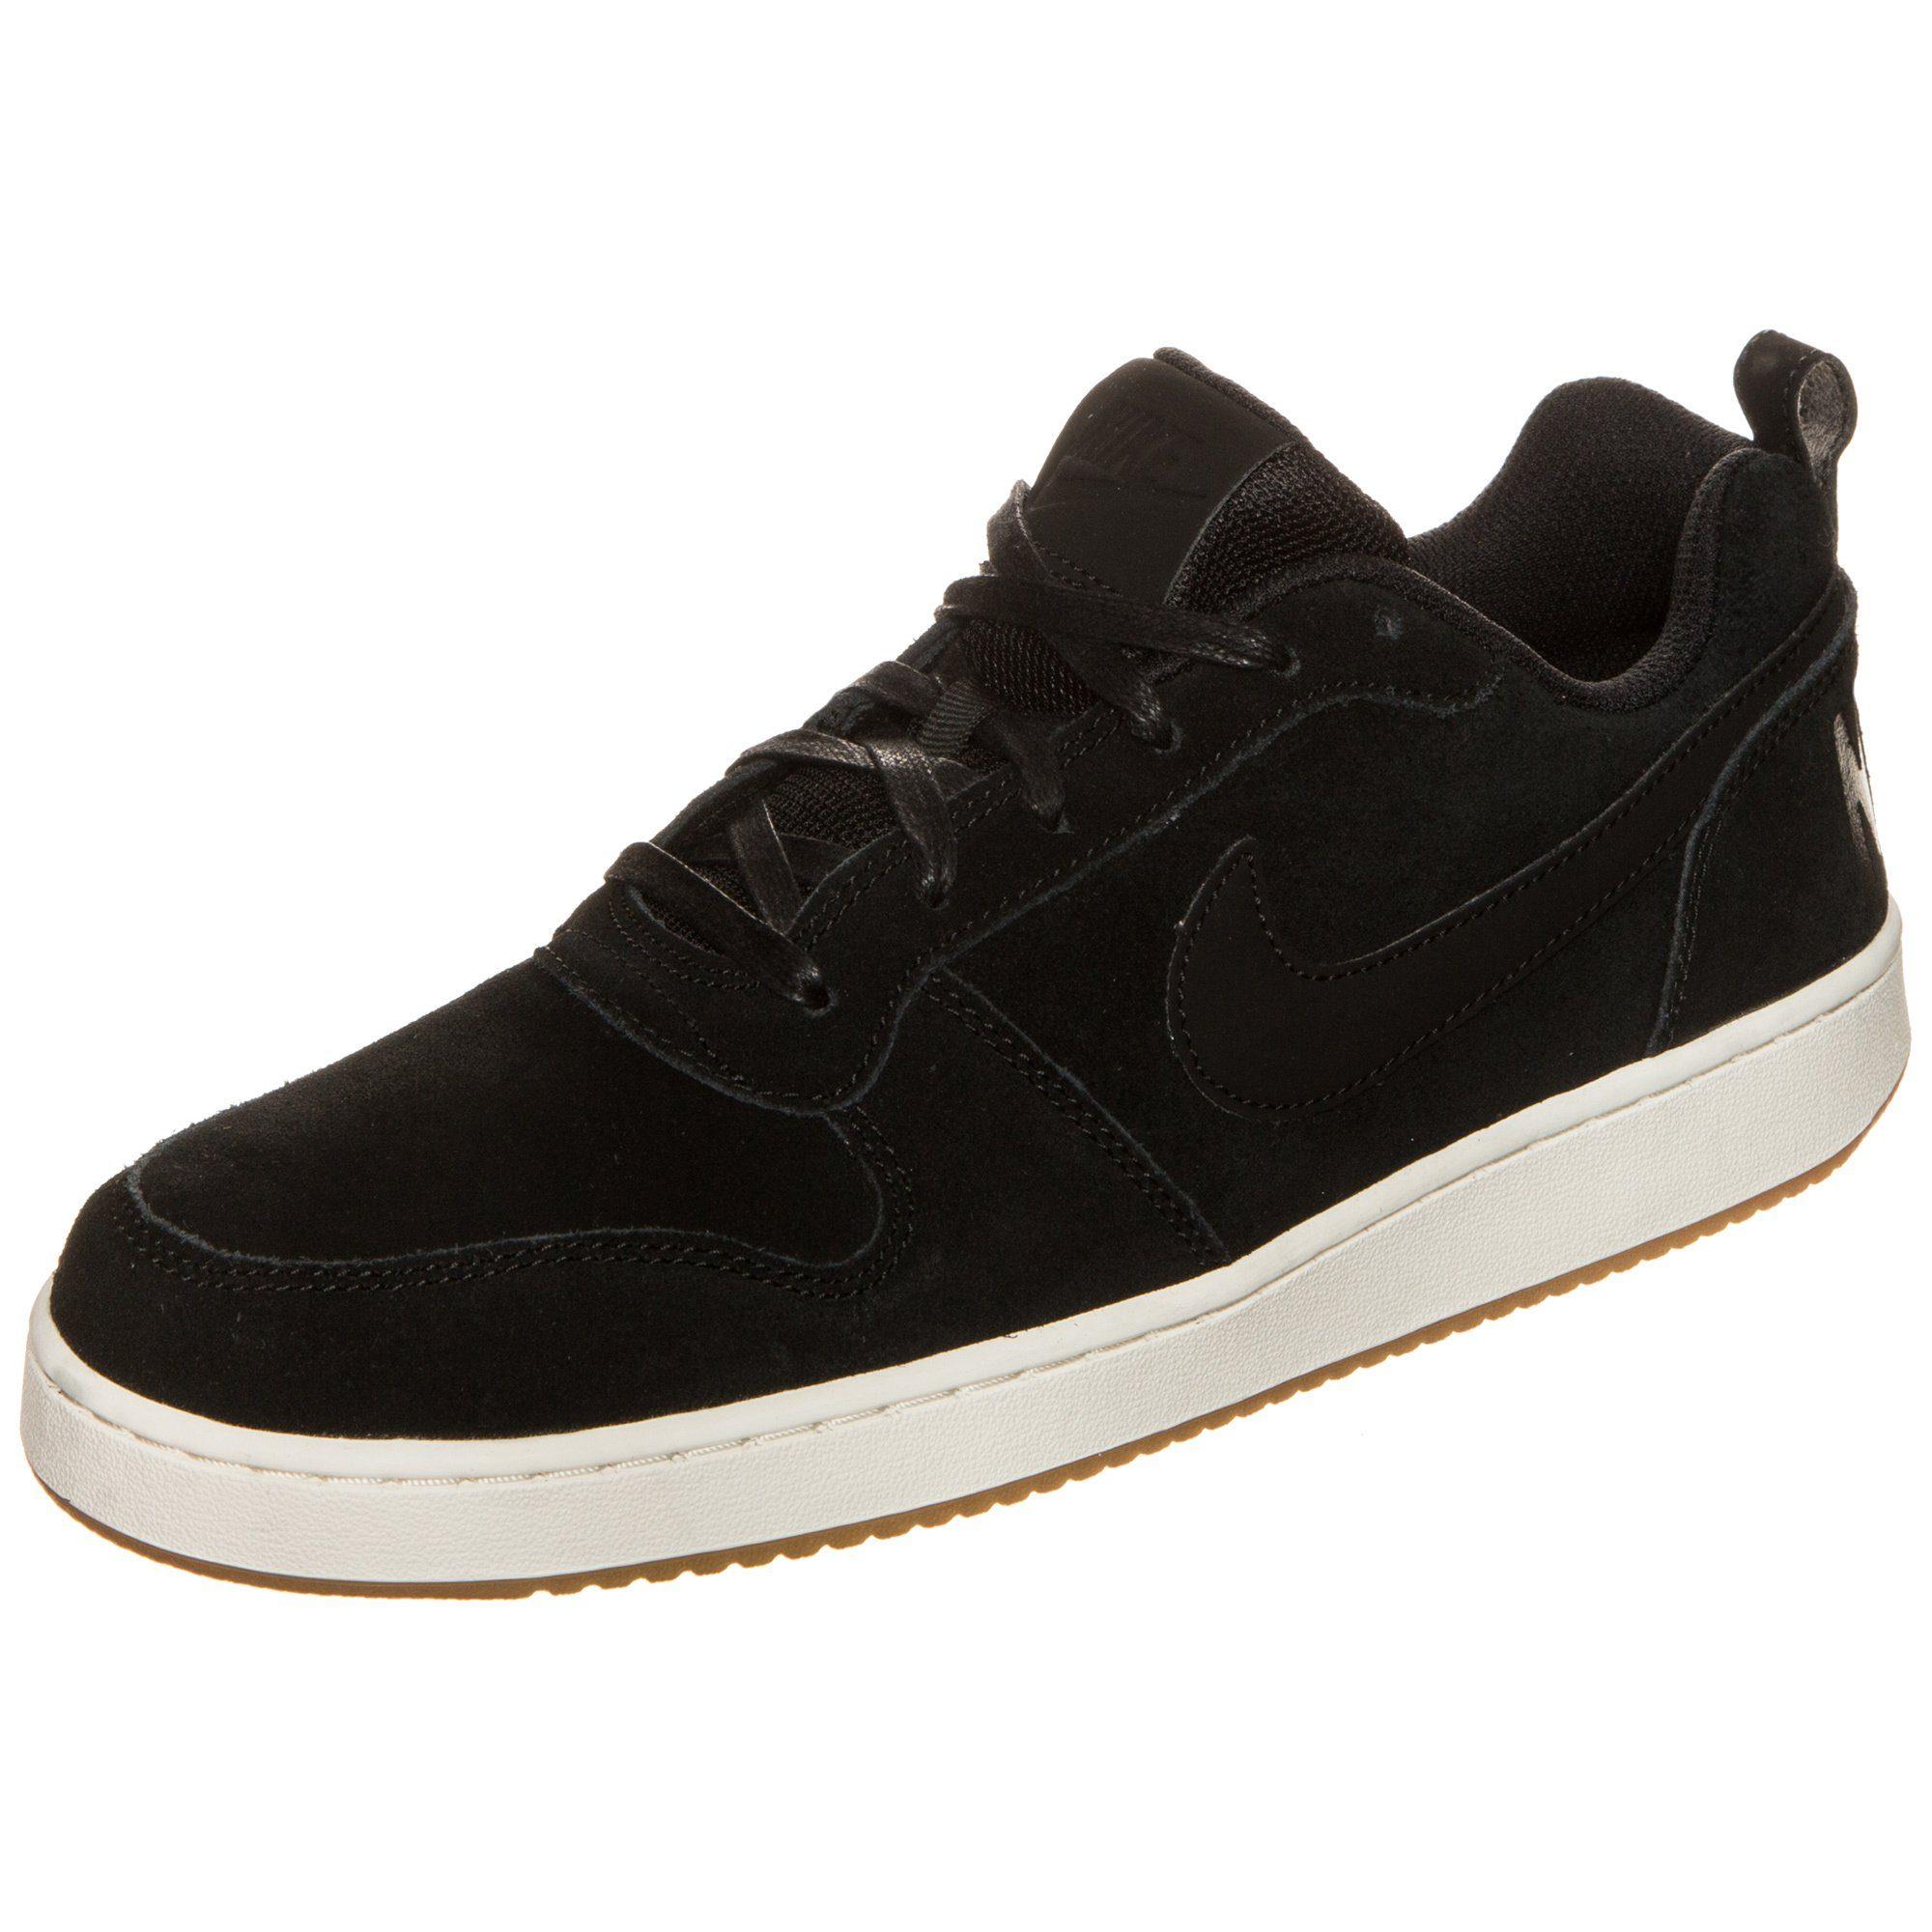 Nike Sportswear Court Borough Low Premium Sneaker Herren online kaufen  schwarz